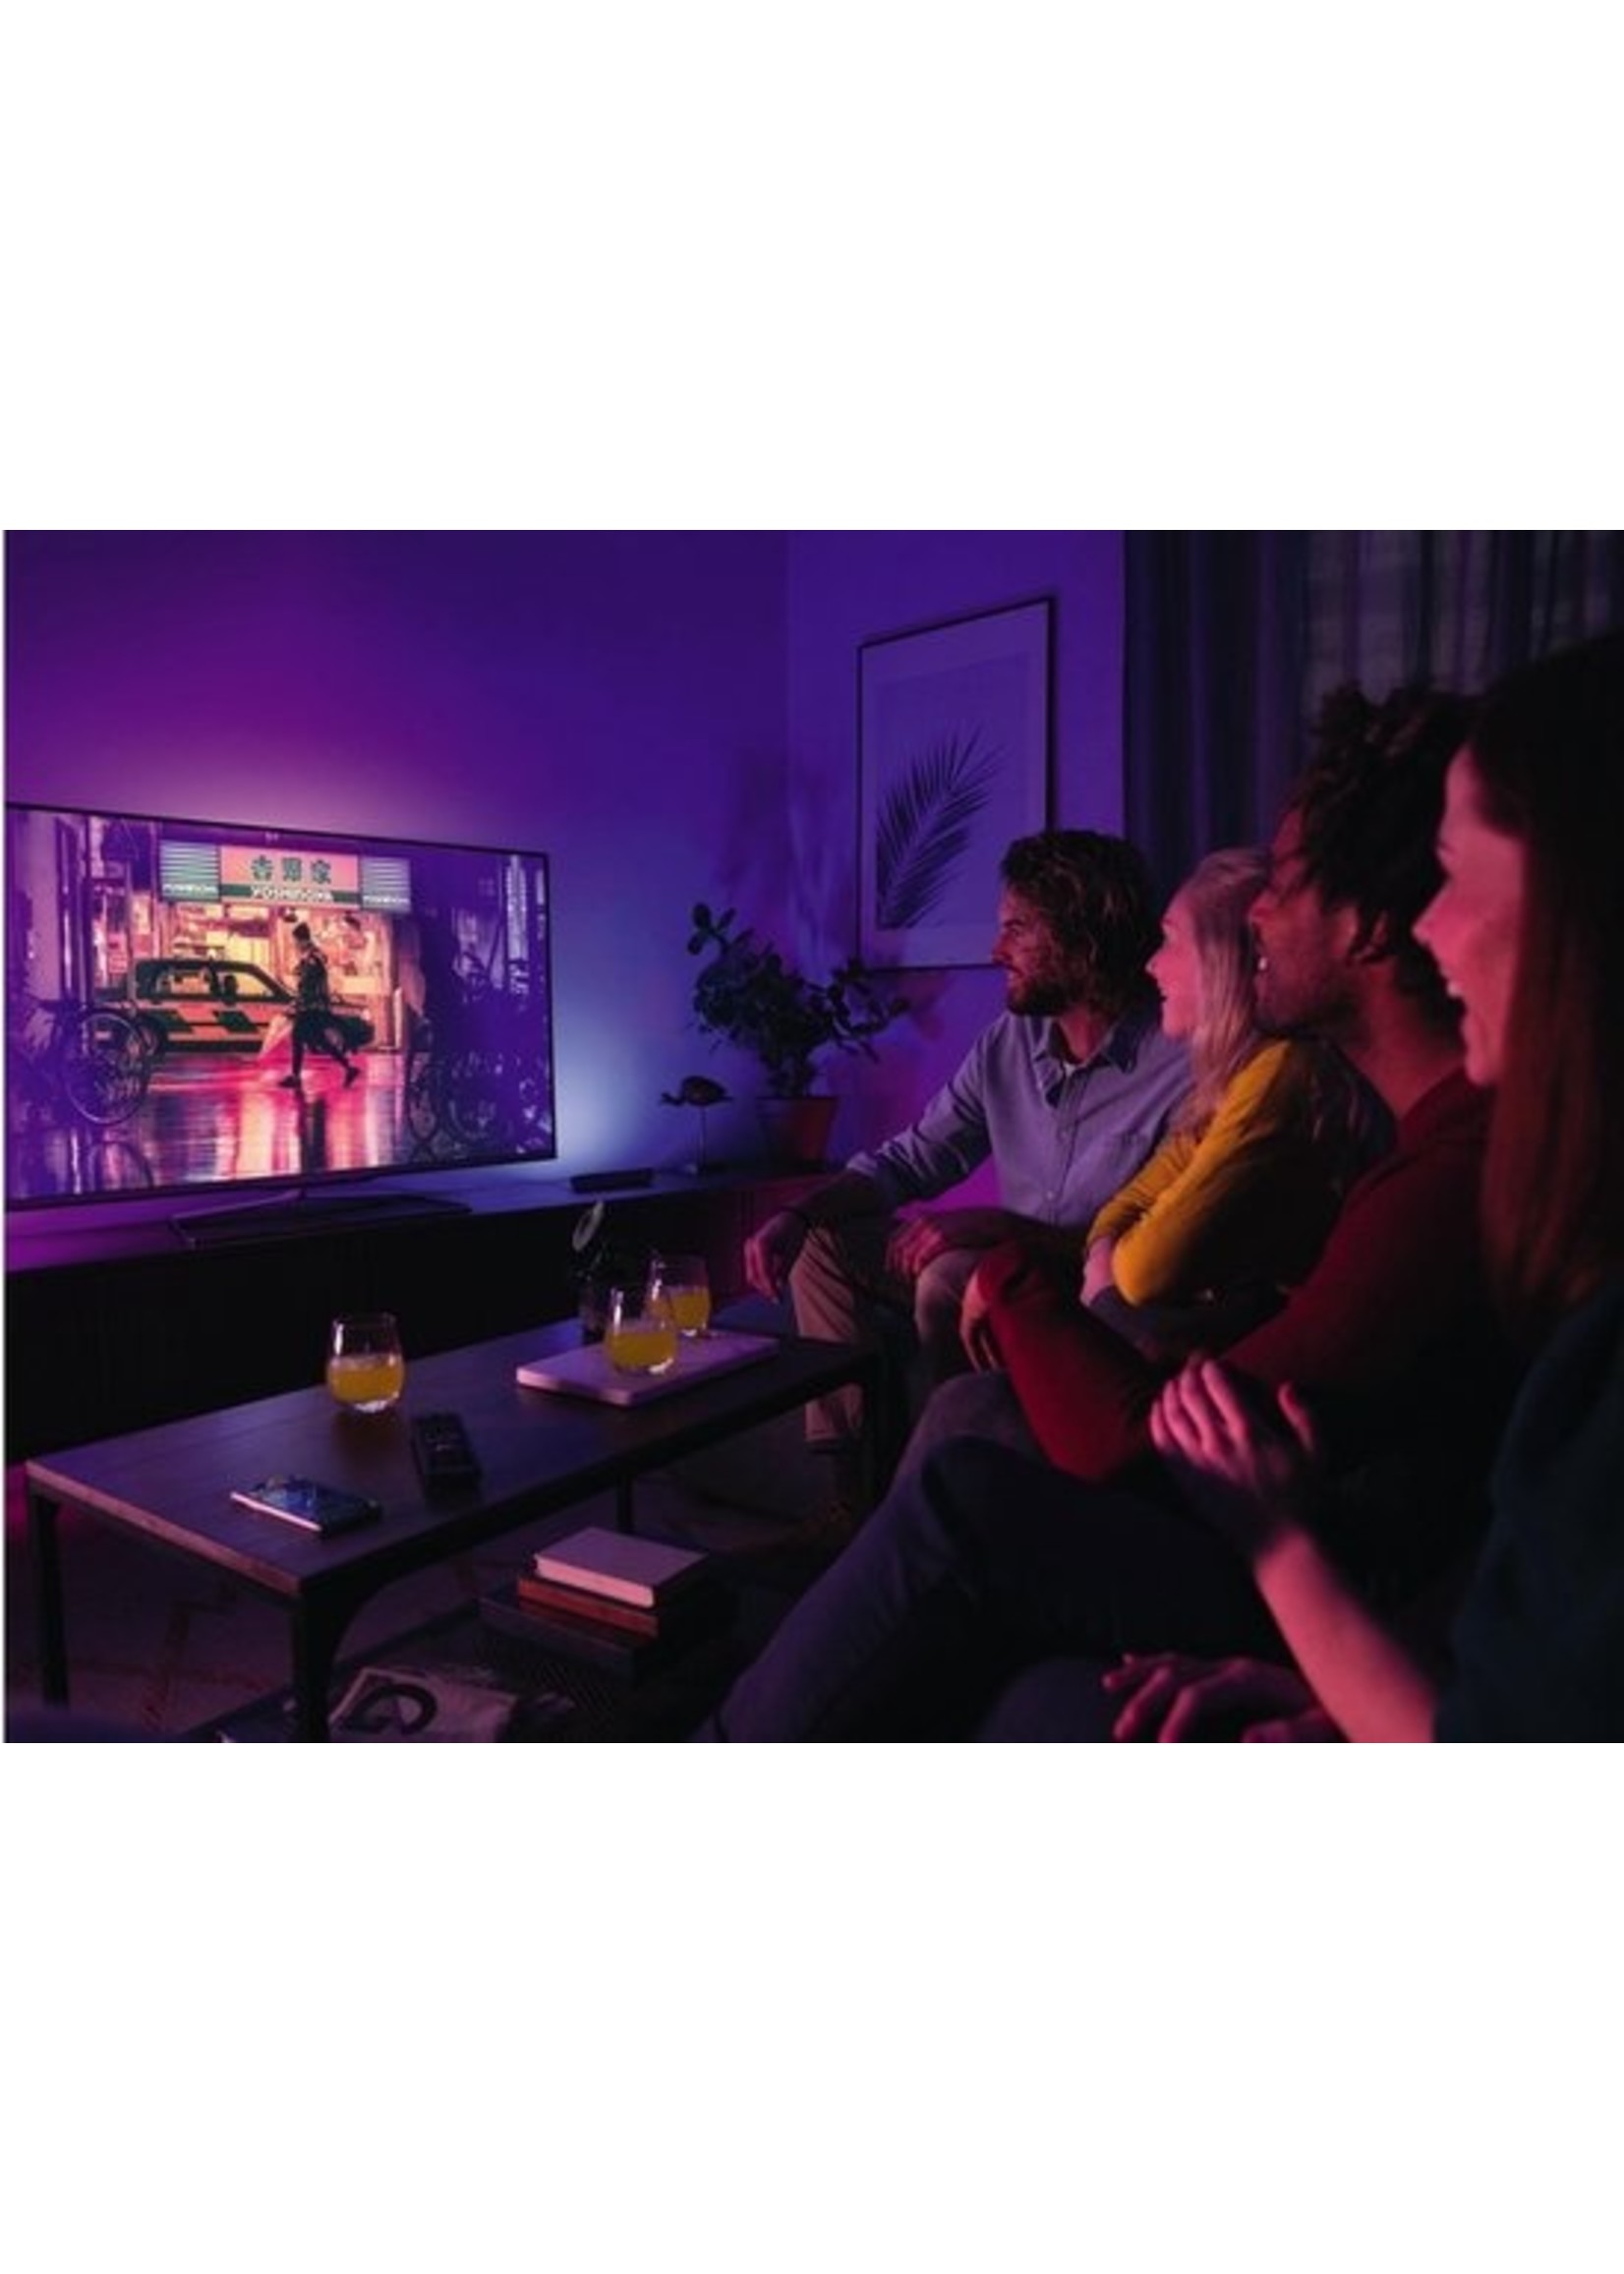 Philips Philips Hue Play Lichtbalk Tafellamp basis - White and Color Ambiance - Gëintegreerd LED - Zwart - Bluetooth - 2 Stuks koopjeshoek